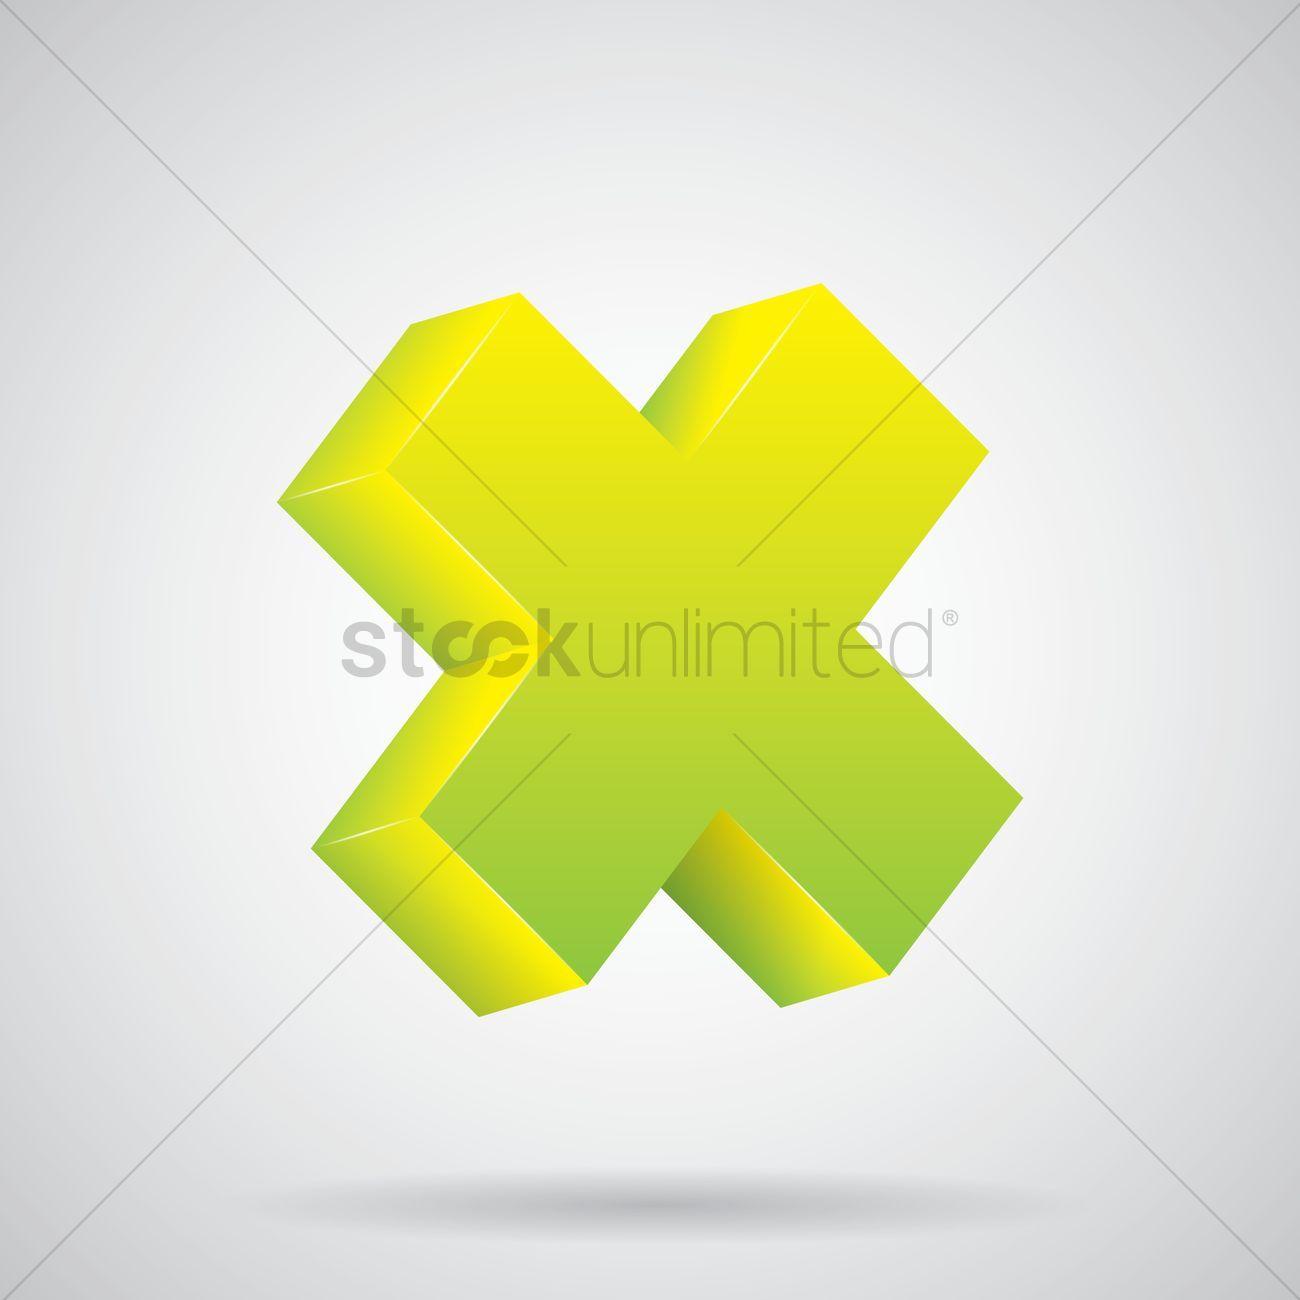 Multiplication Sign Vectors Stock Clipart Affiliate Sign Multiplication Vectors Clipart Stock Affiliate In 2020 Logo Design Icon Design Logos